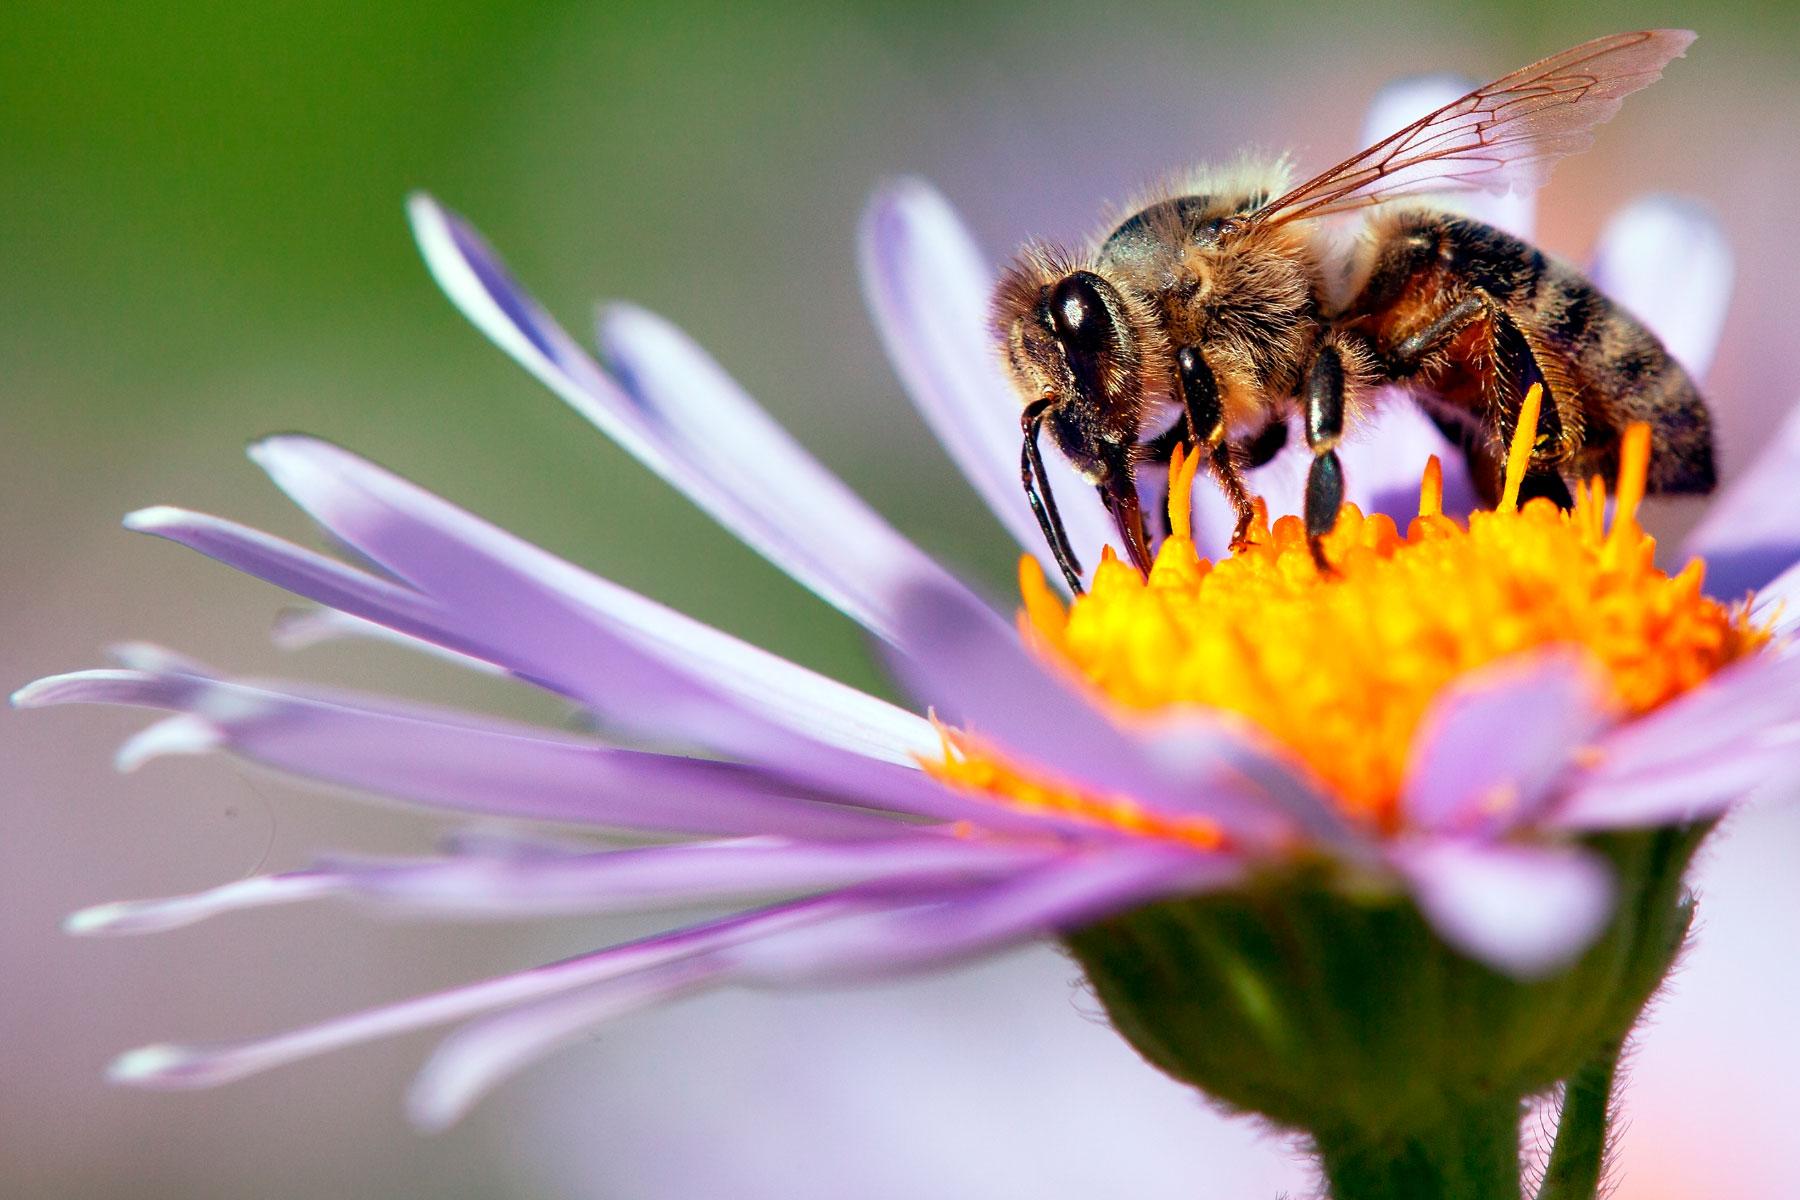 Where bees collect pollen